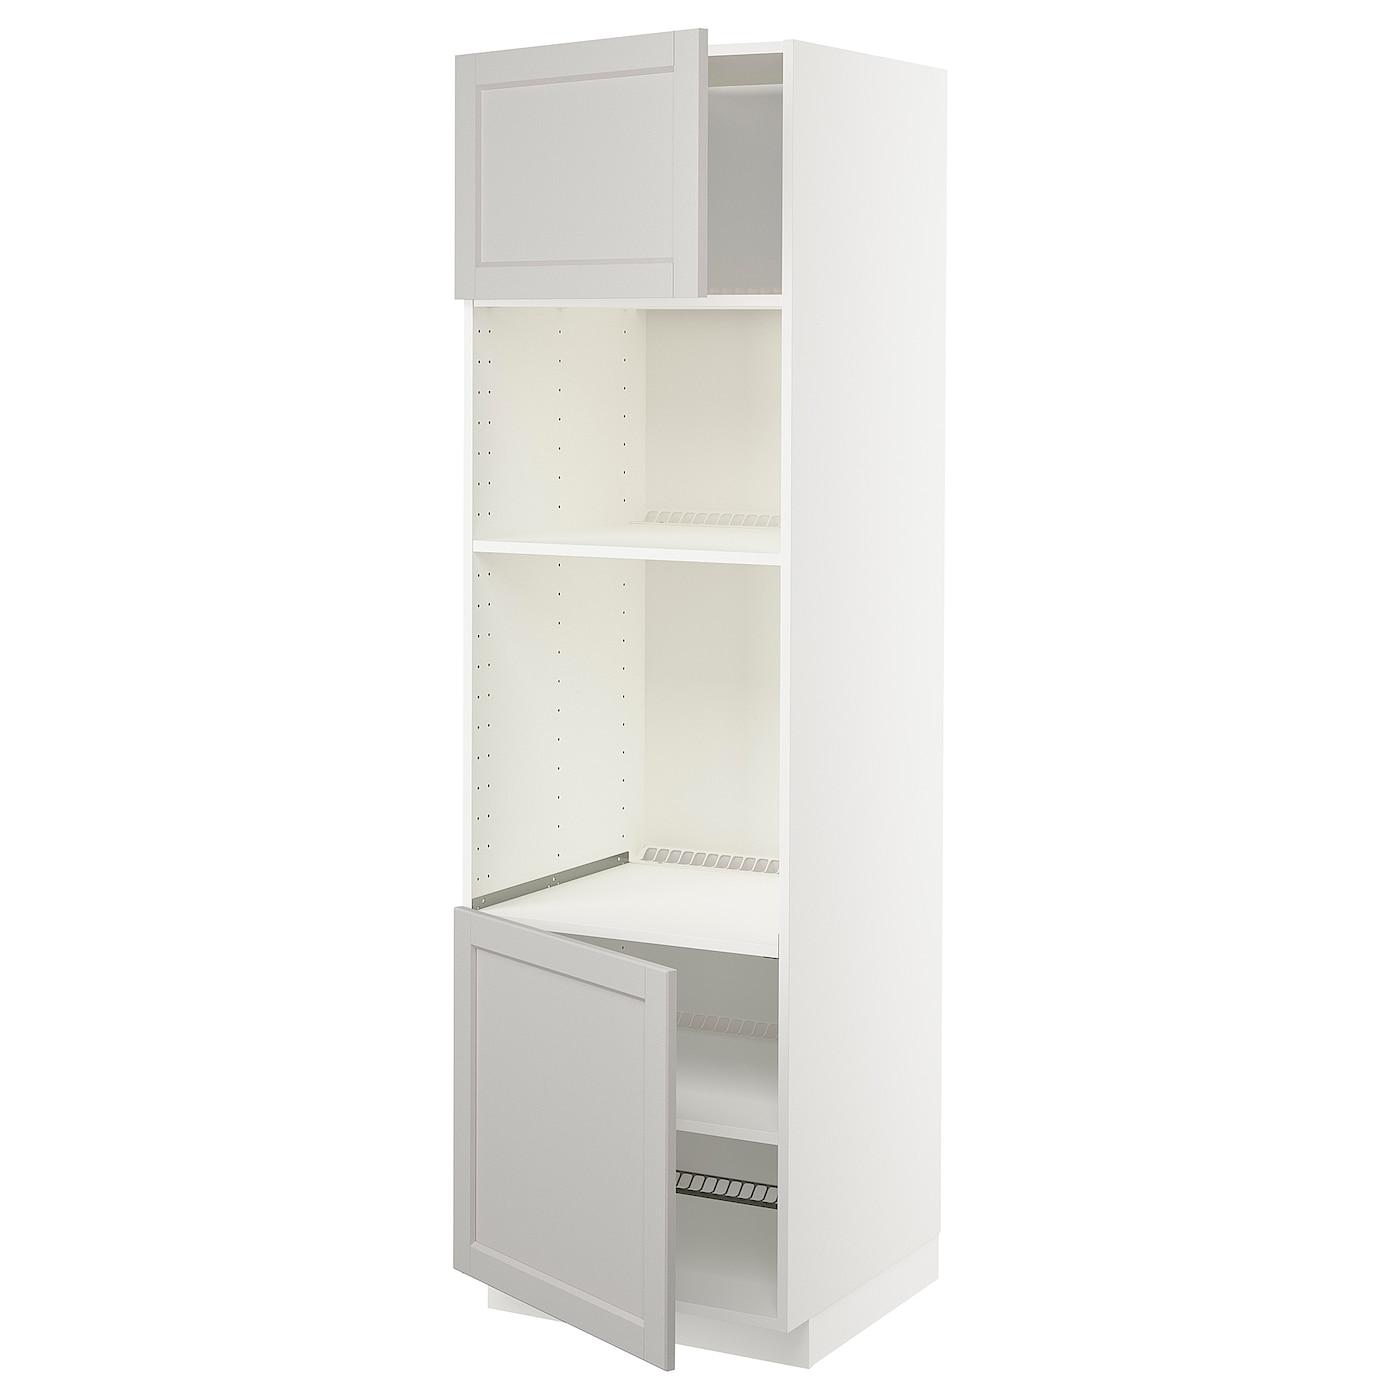 METOD HS f Ofen/Mikro m 2 Türen/Böden